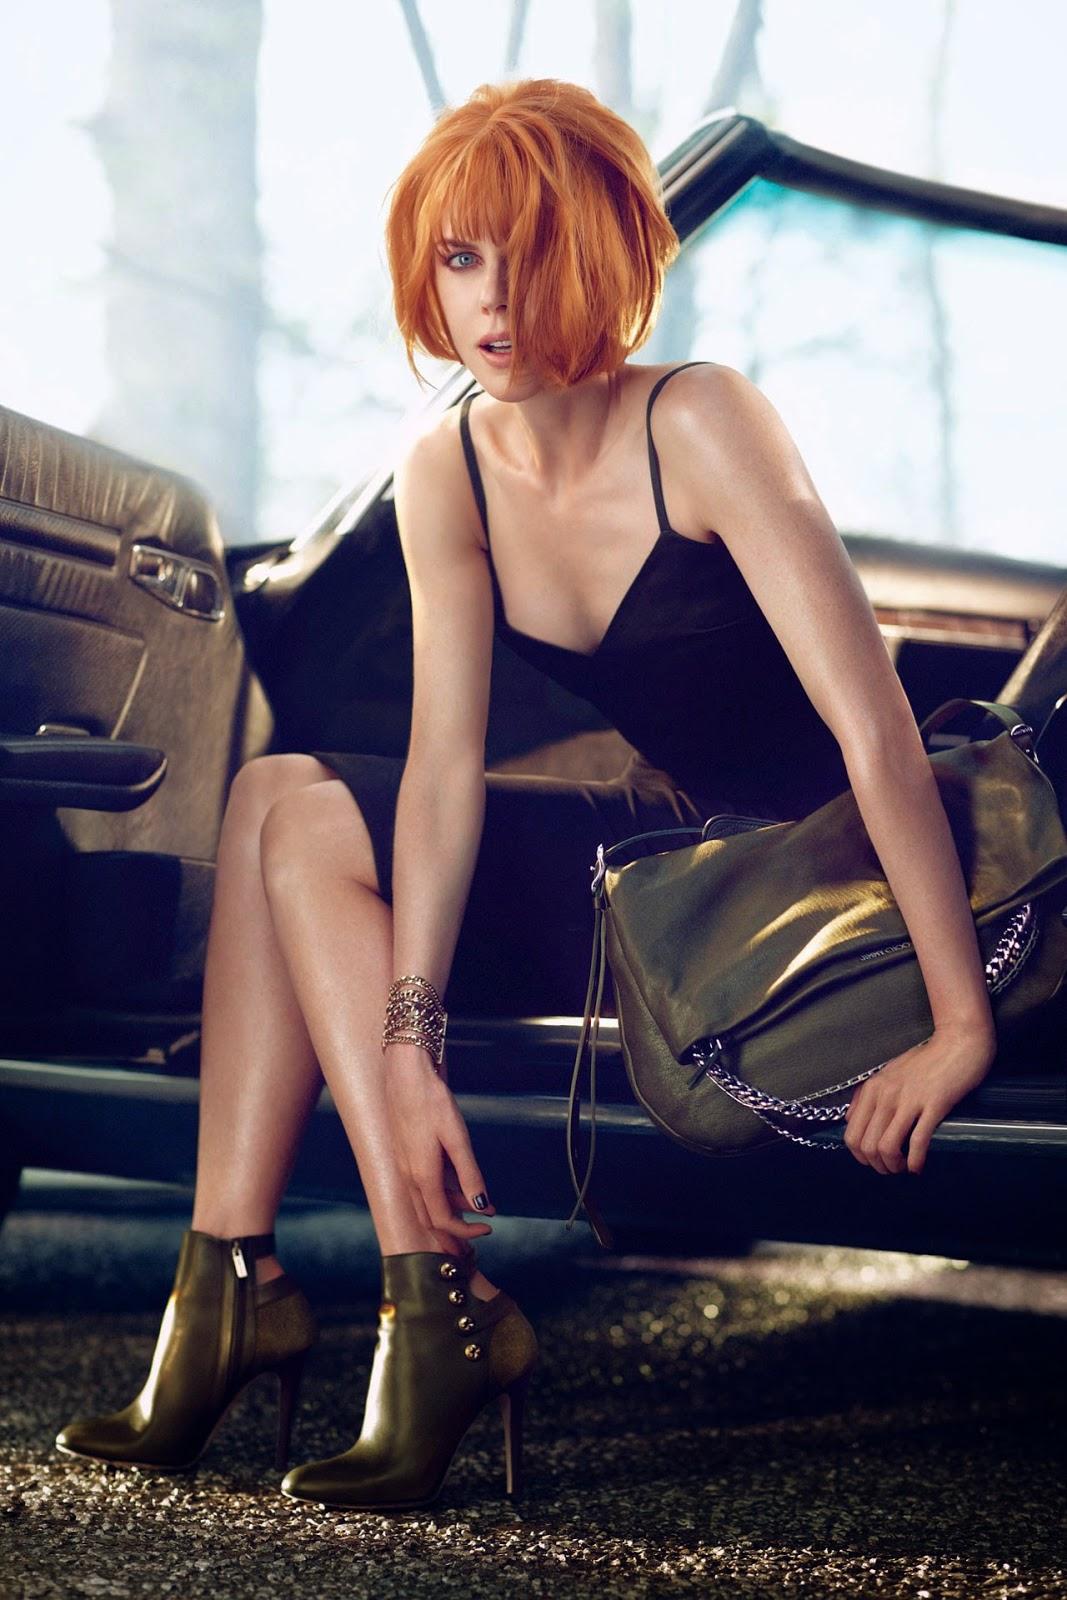 Nicole Kidman in a sexy photo shoot shoeing her legs